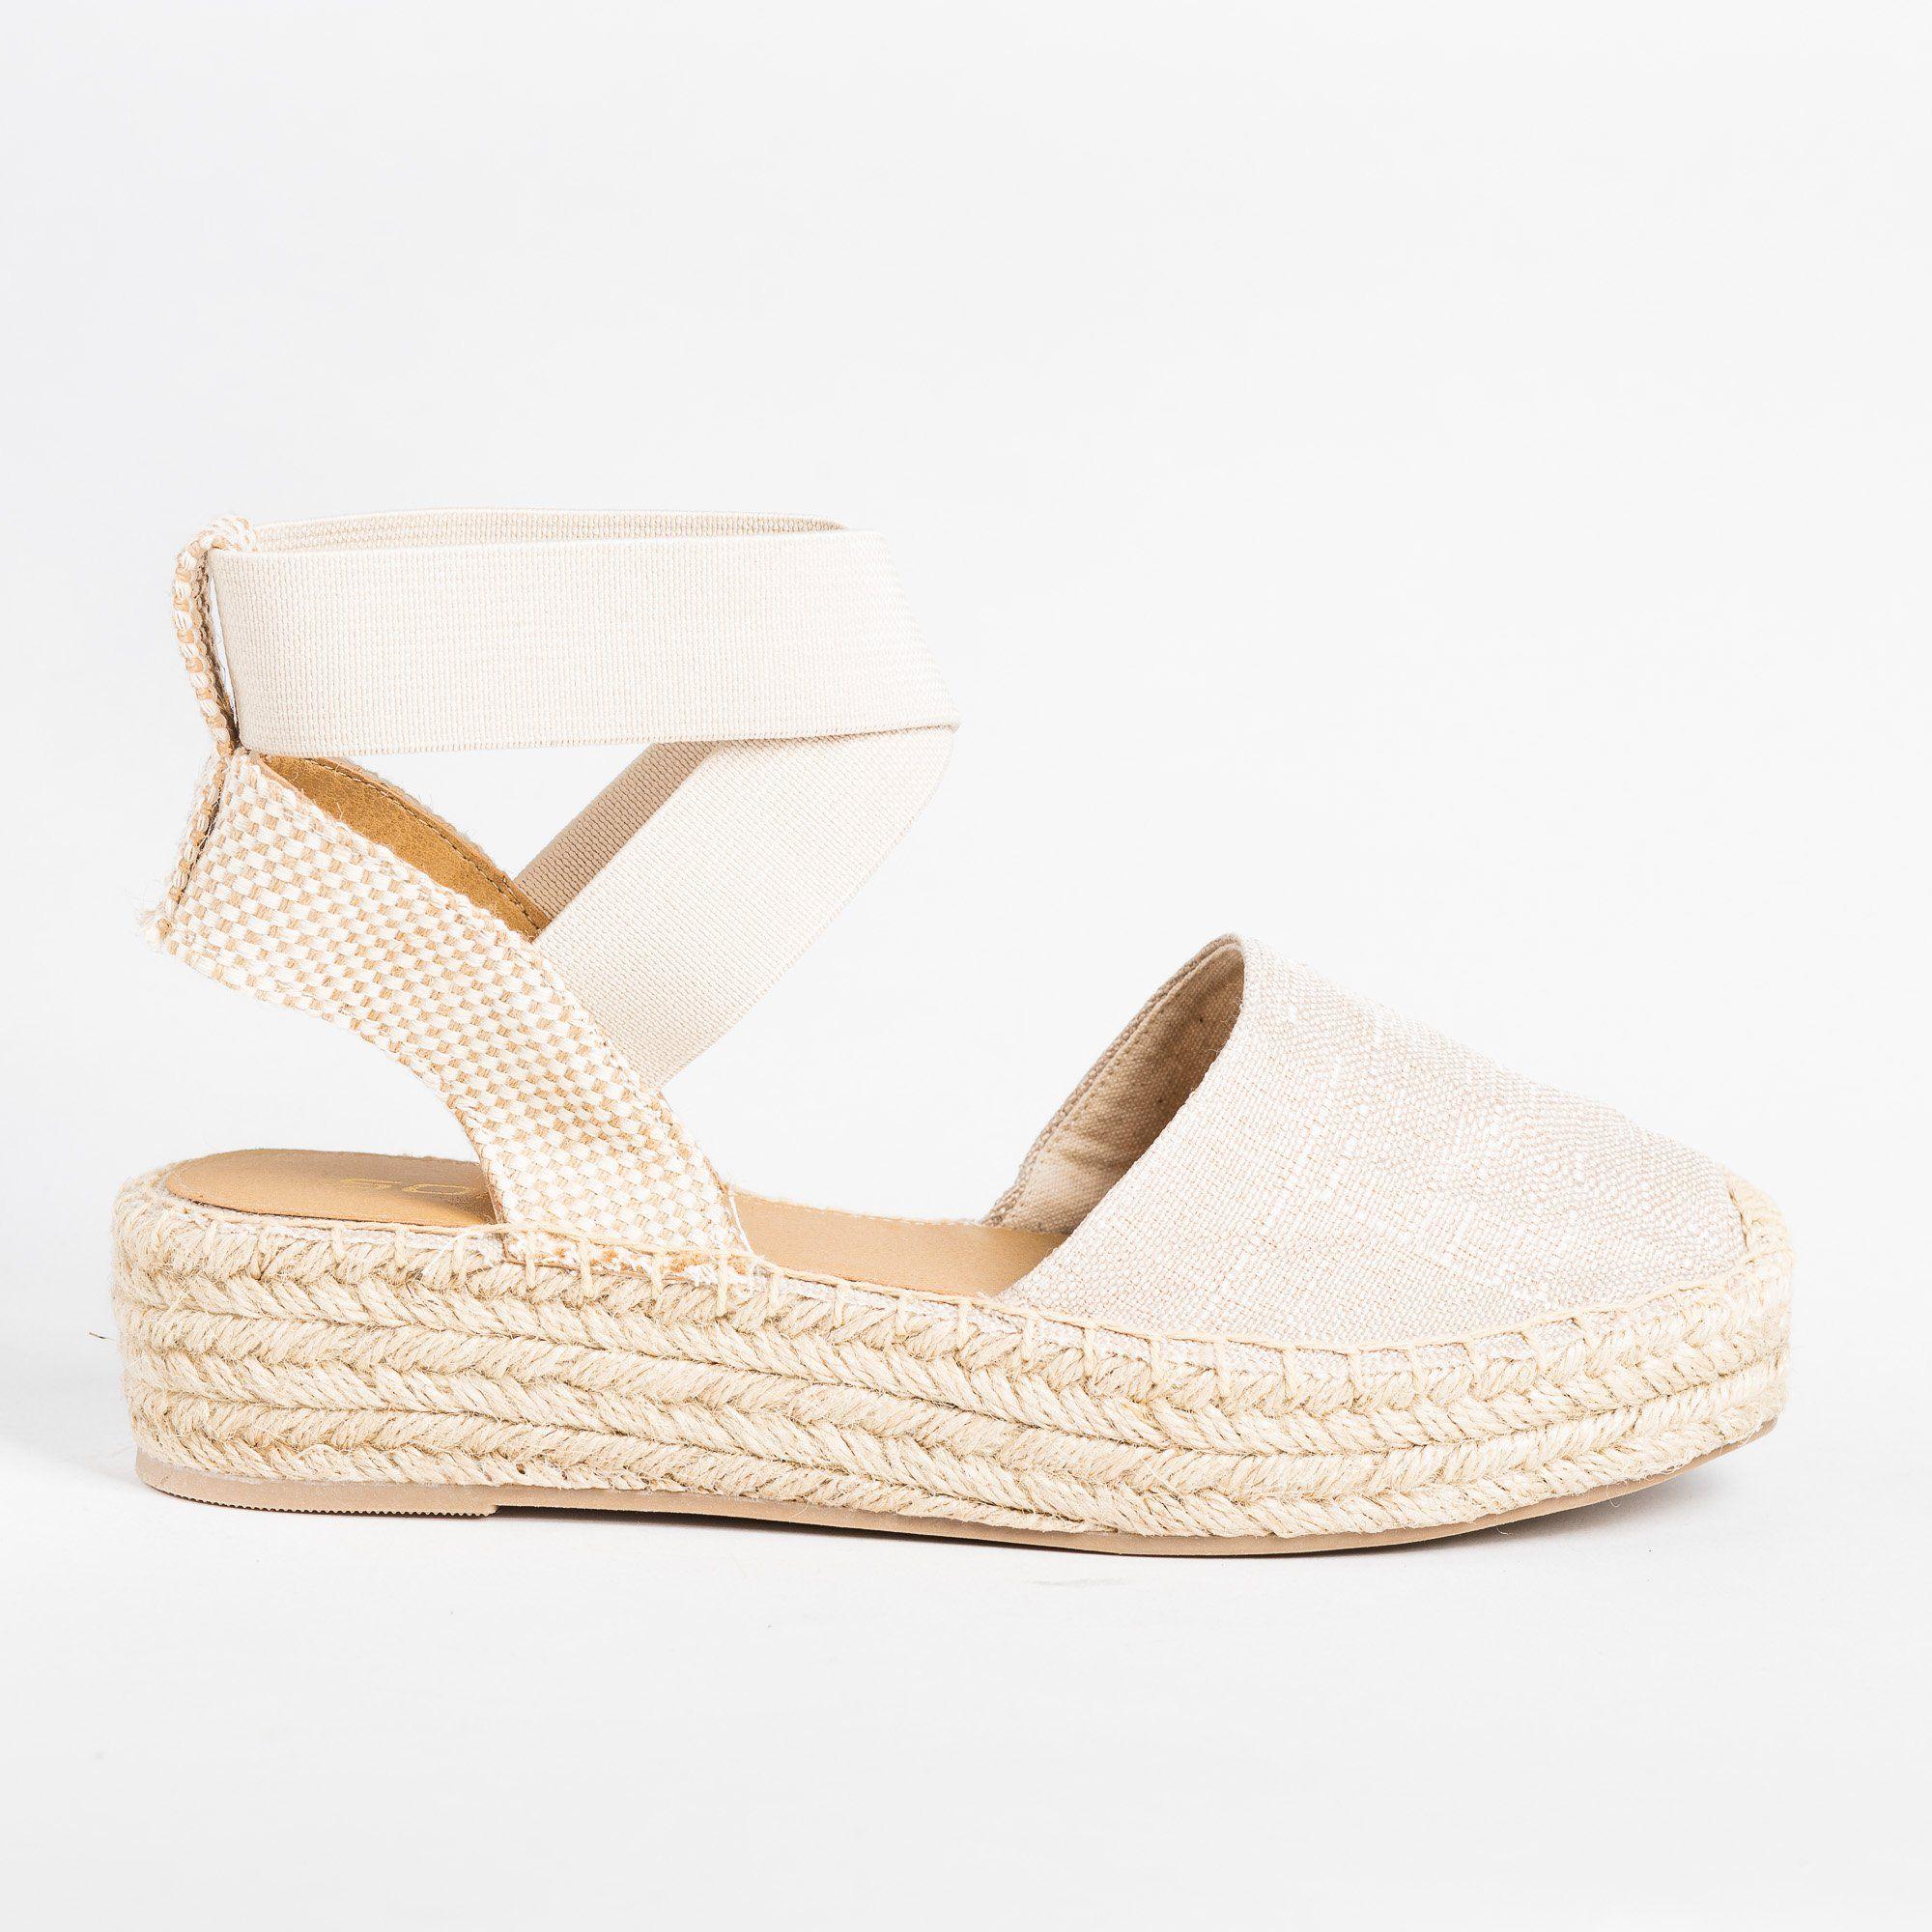 Closed-Toe Espadrille Flatform Sandals